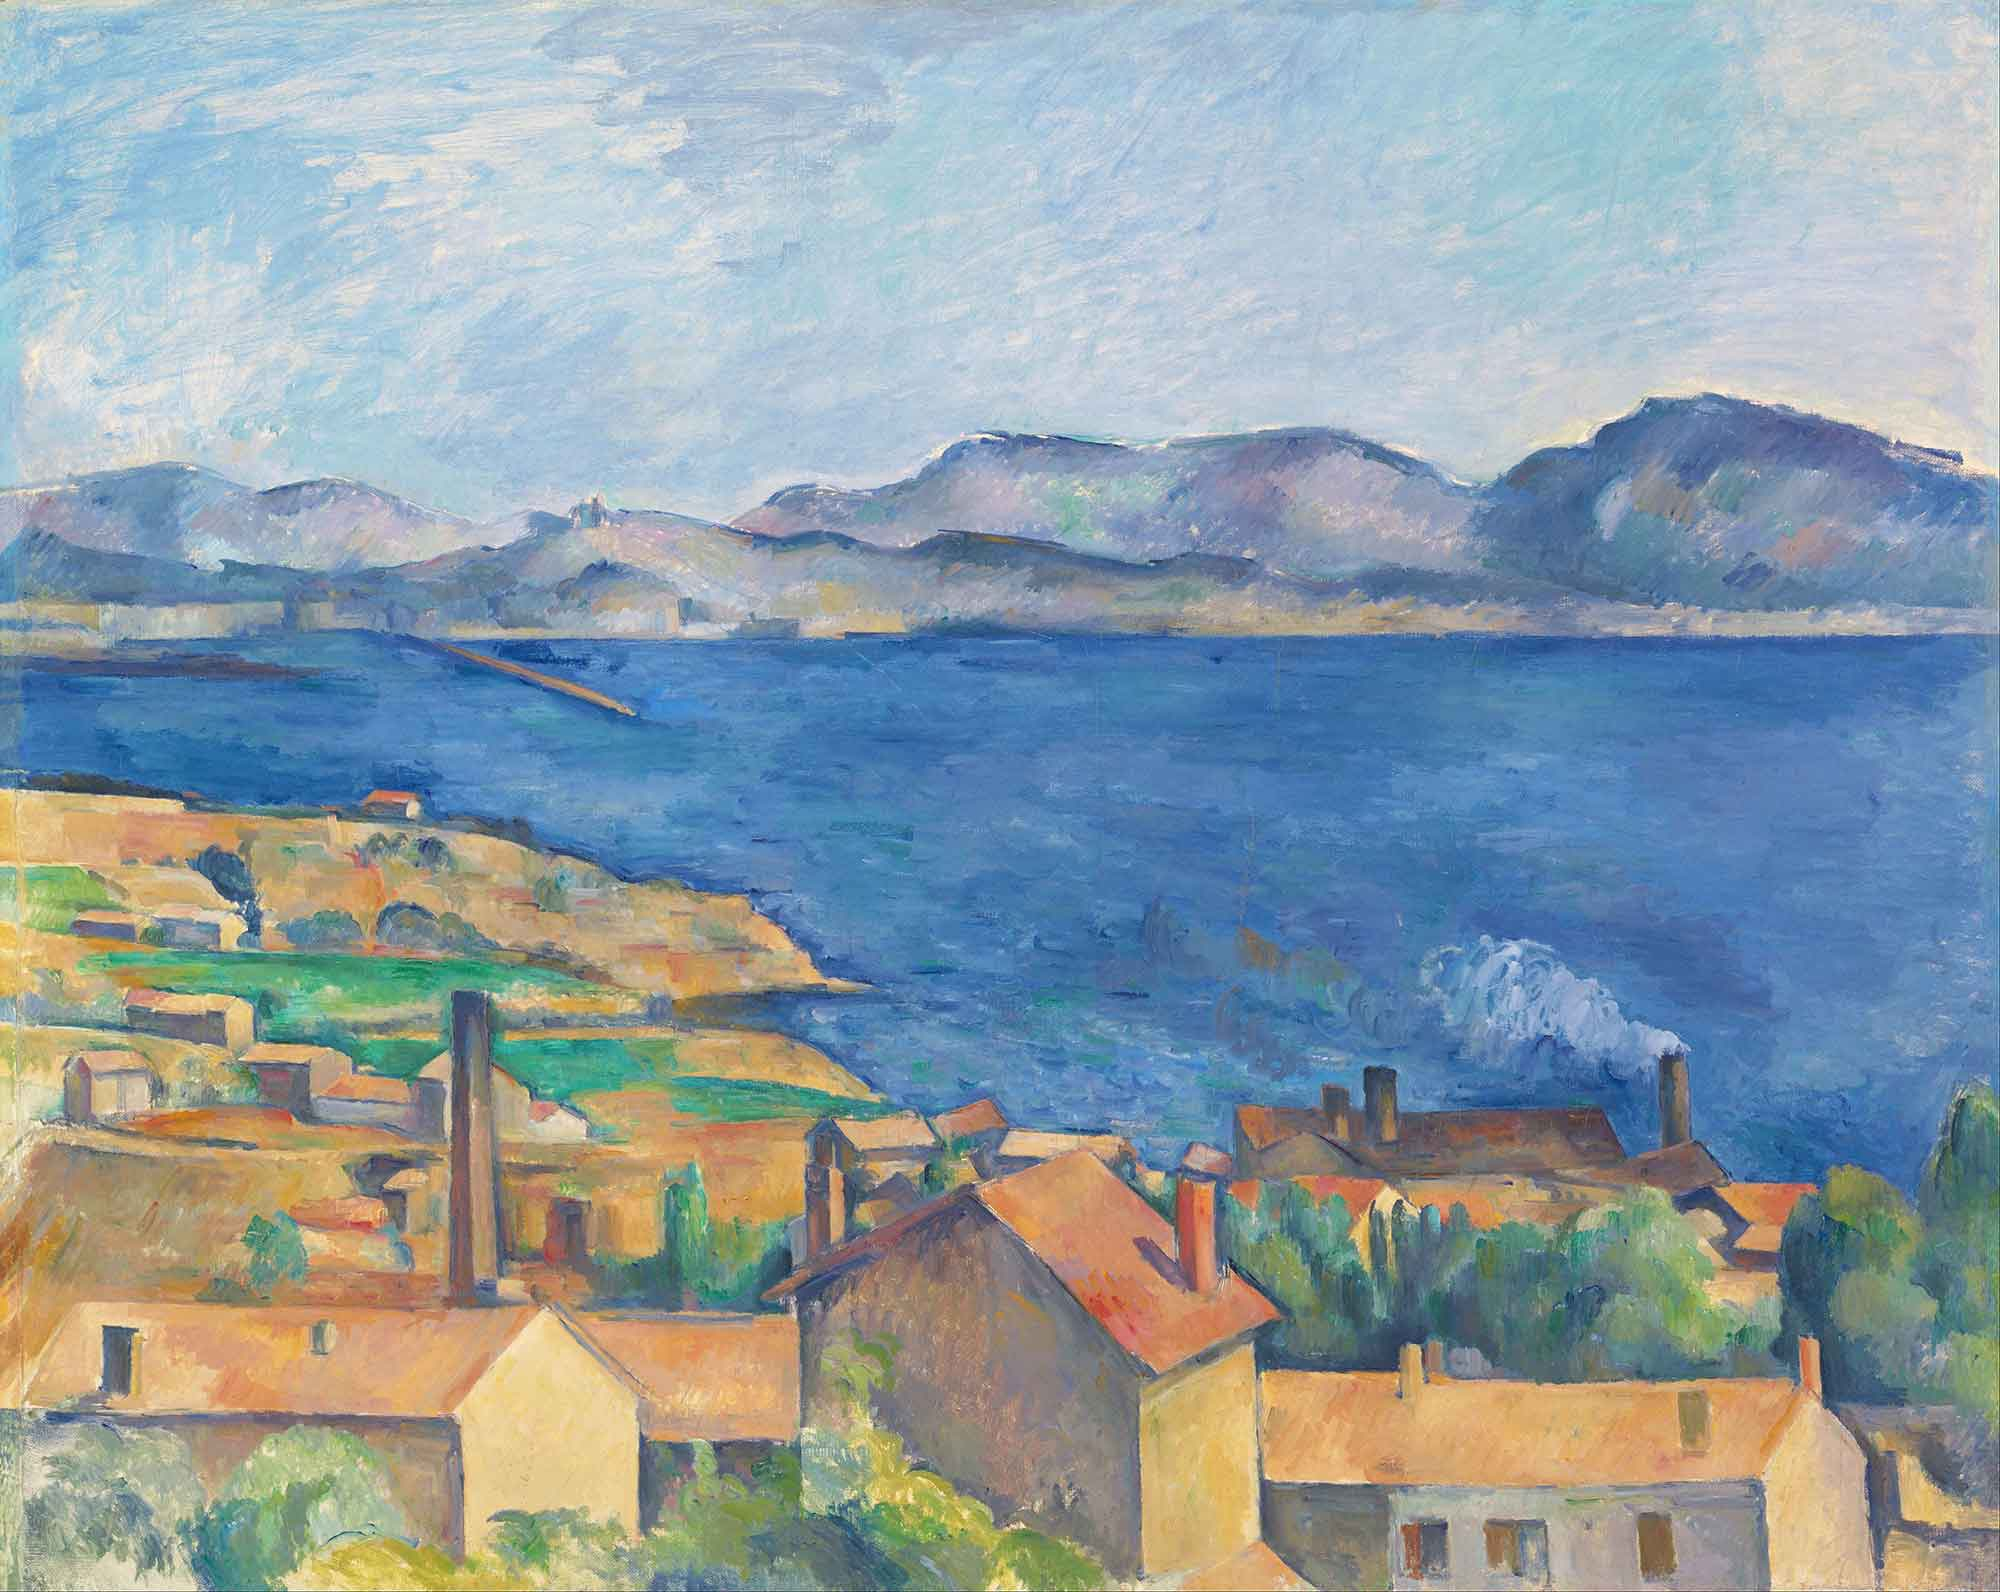 Paul Cezanne Estaque Körfezi